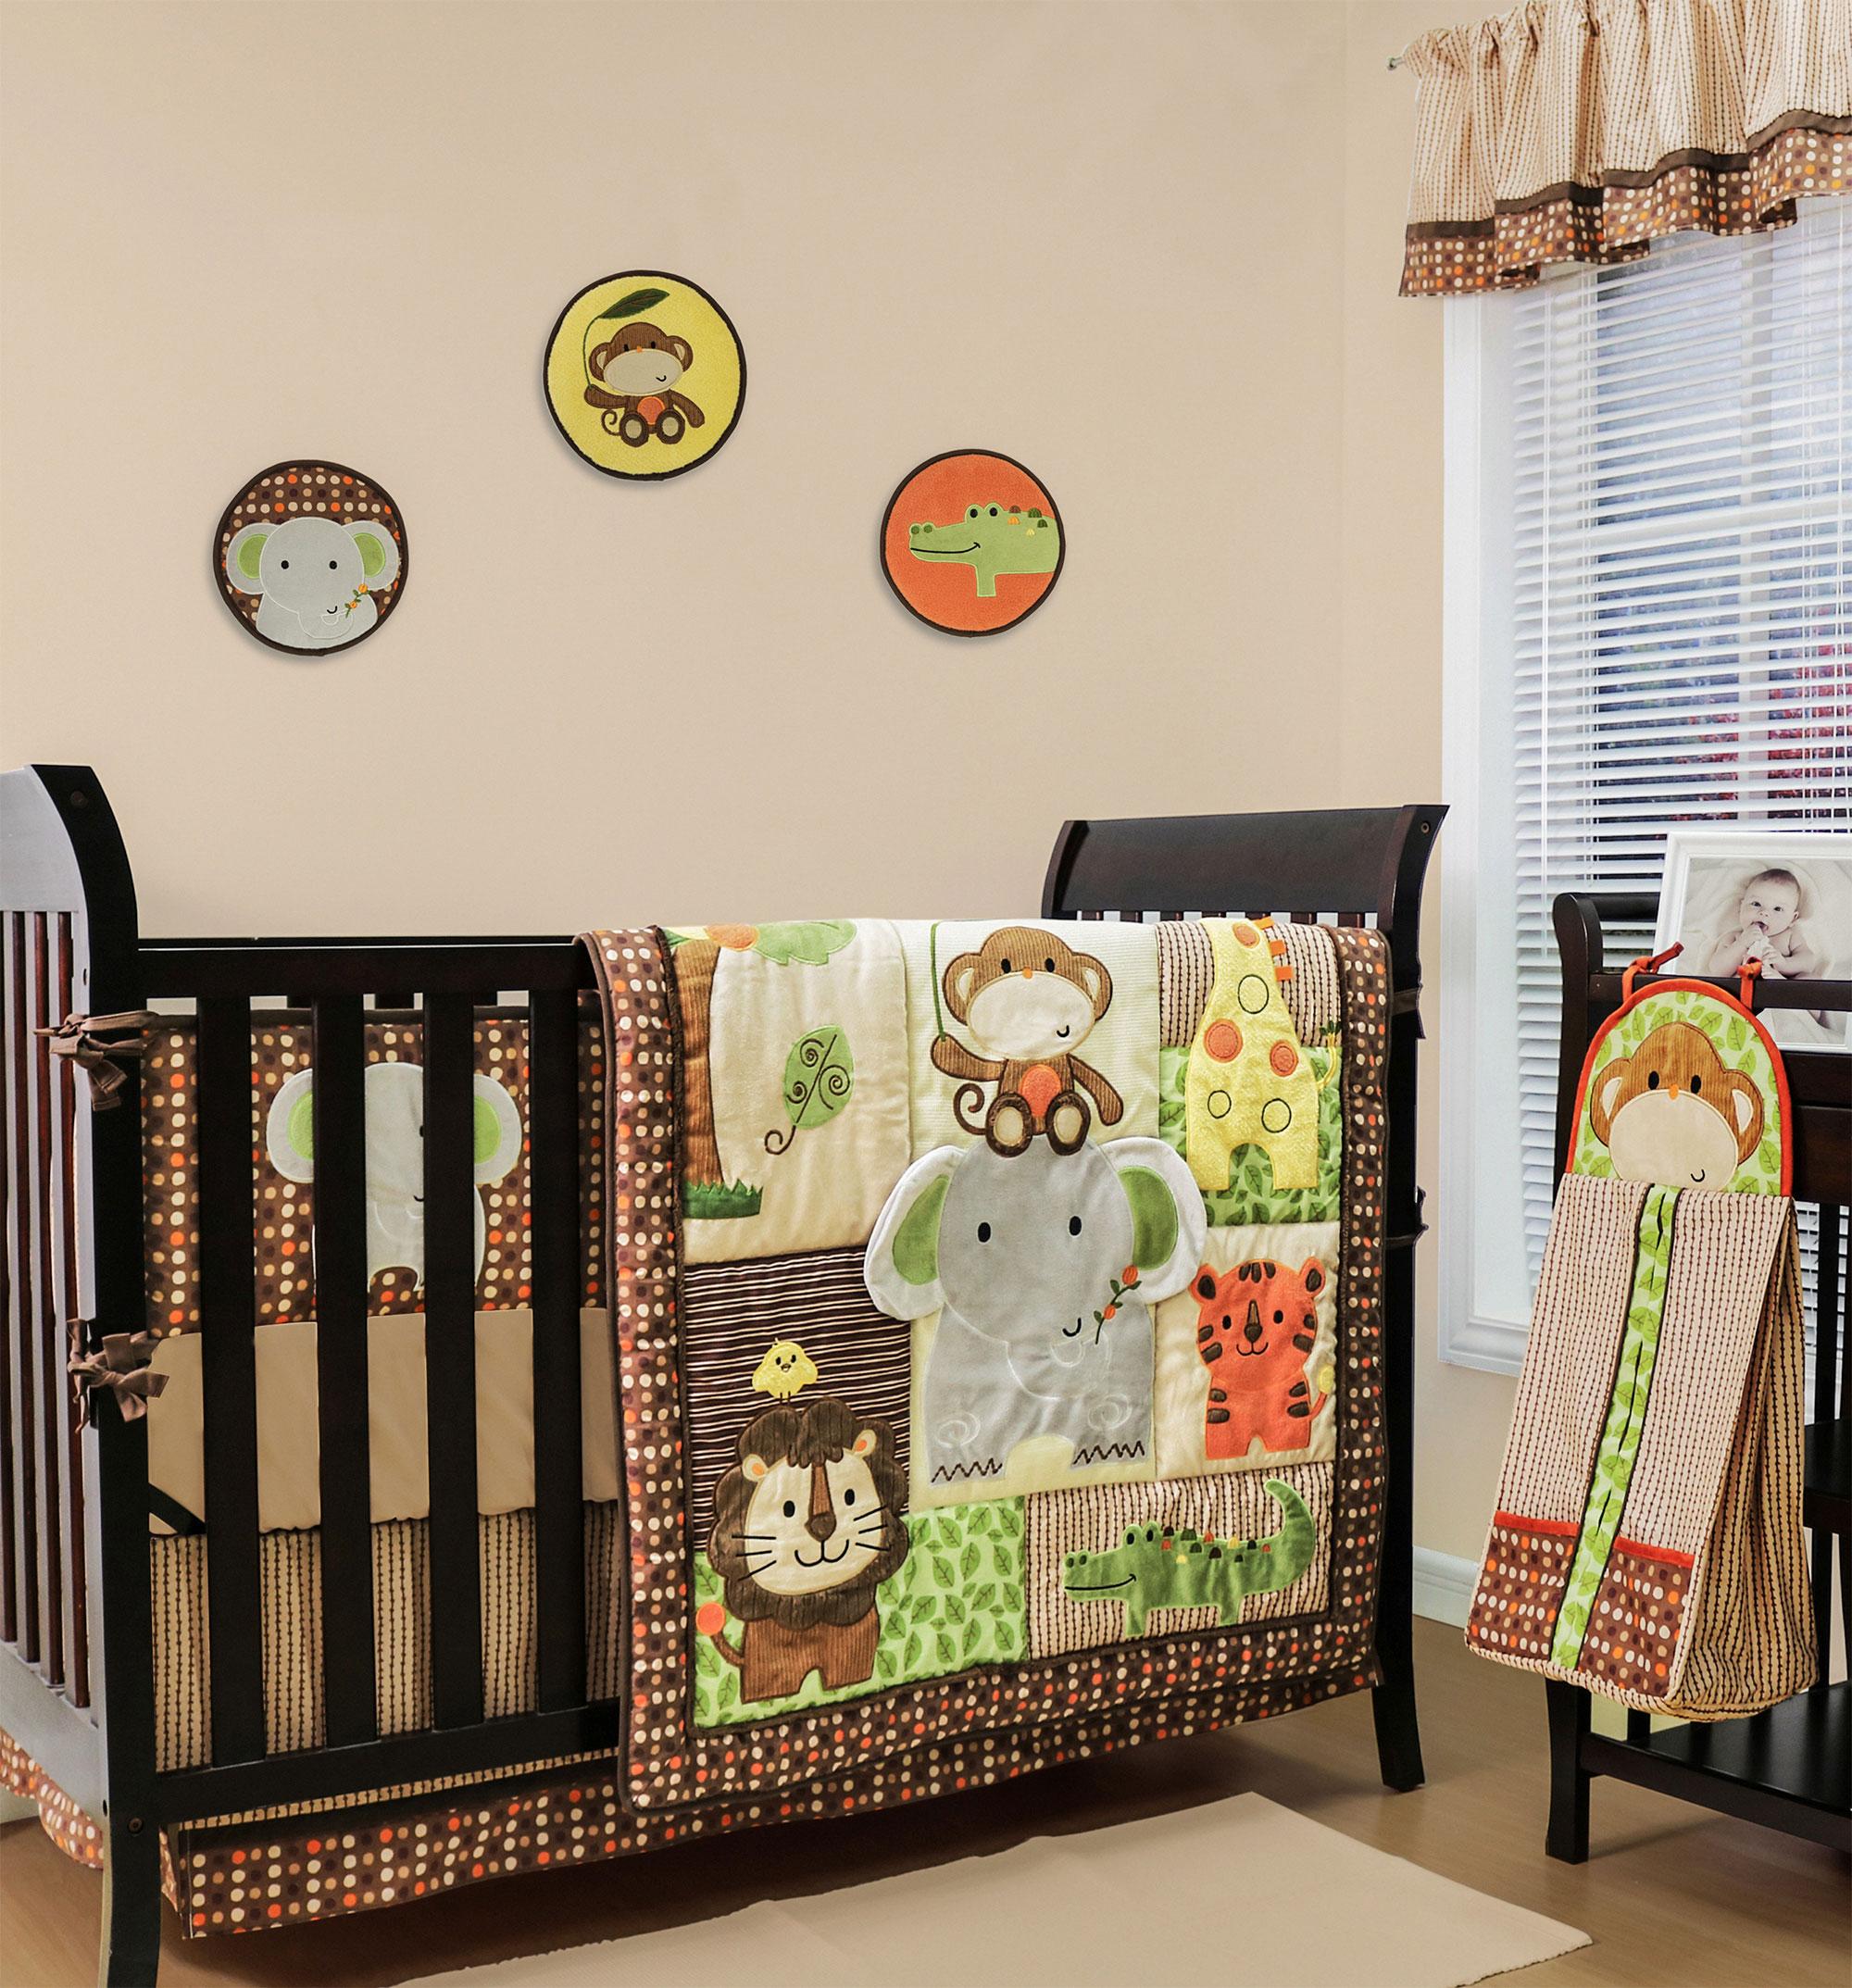 crib bedding set jungle safari theme walk through the zoo 9 baby bedding set